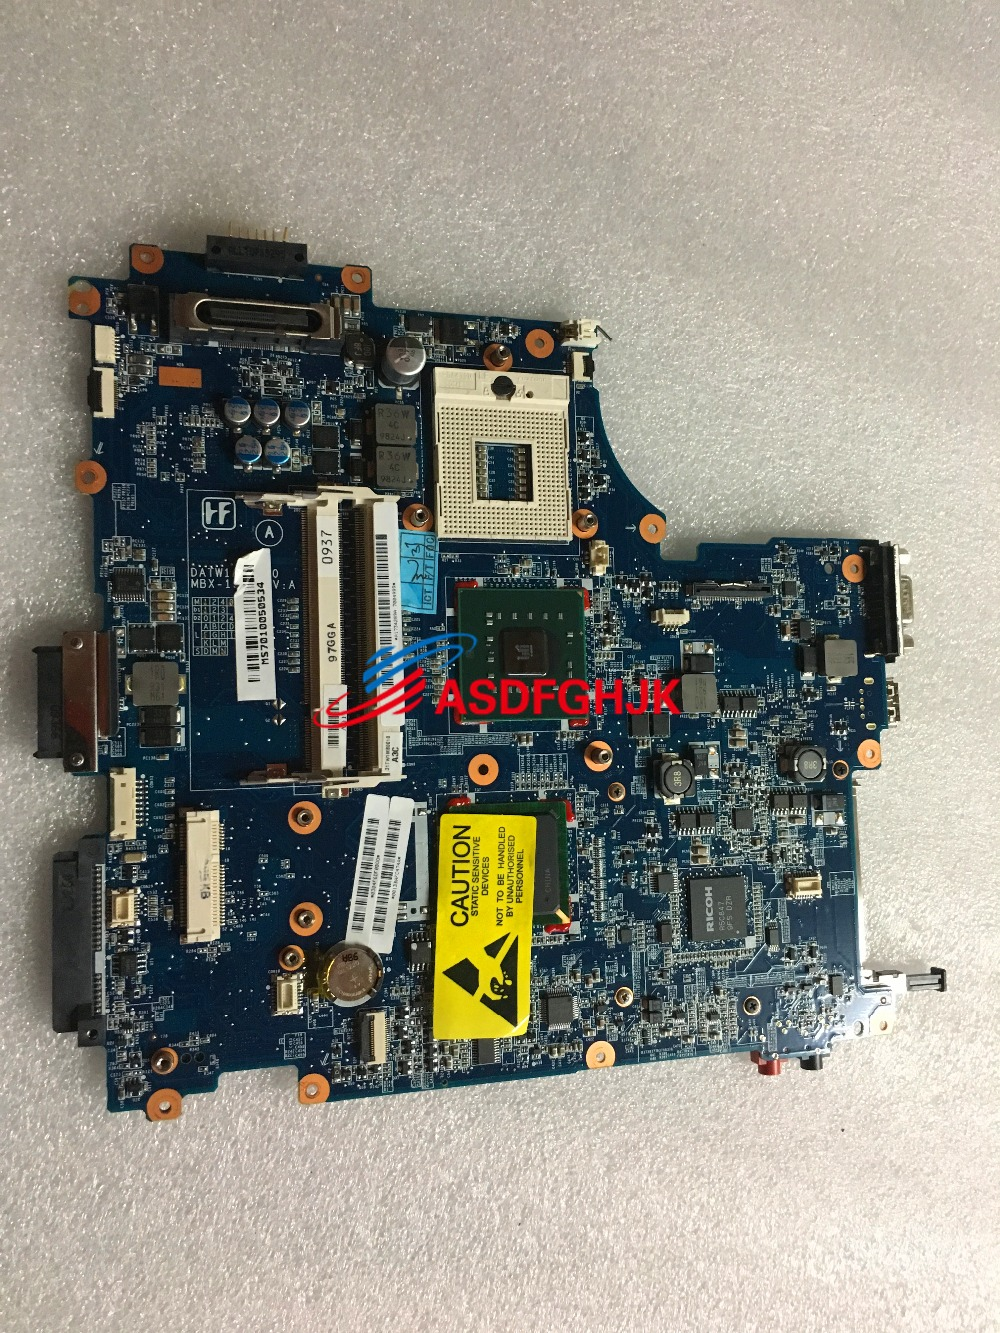 FOR Sony VAIO VGN-BZ BZ11XN  Motherboard MBX-193 DA0TW1MB8C0 A1542723A 100% TESED OKFOR Sony VAIO VGN-BZ BZ11XN  Motherboard MBX-193 DA0TW1MB8C0 A1542723A 100% TESED OK